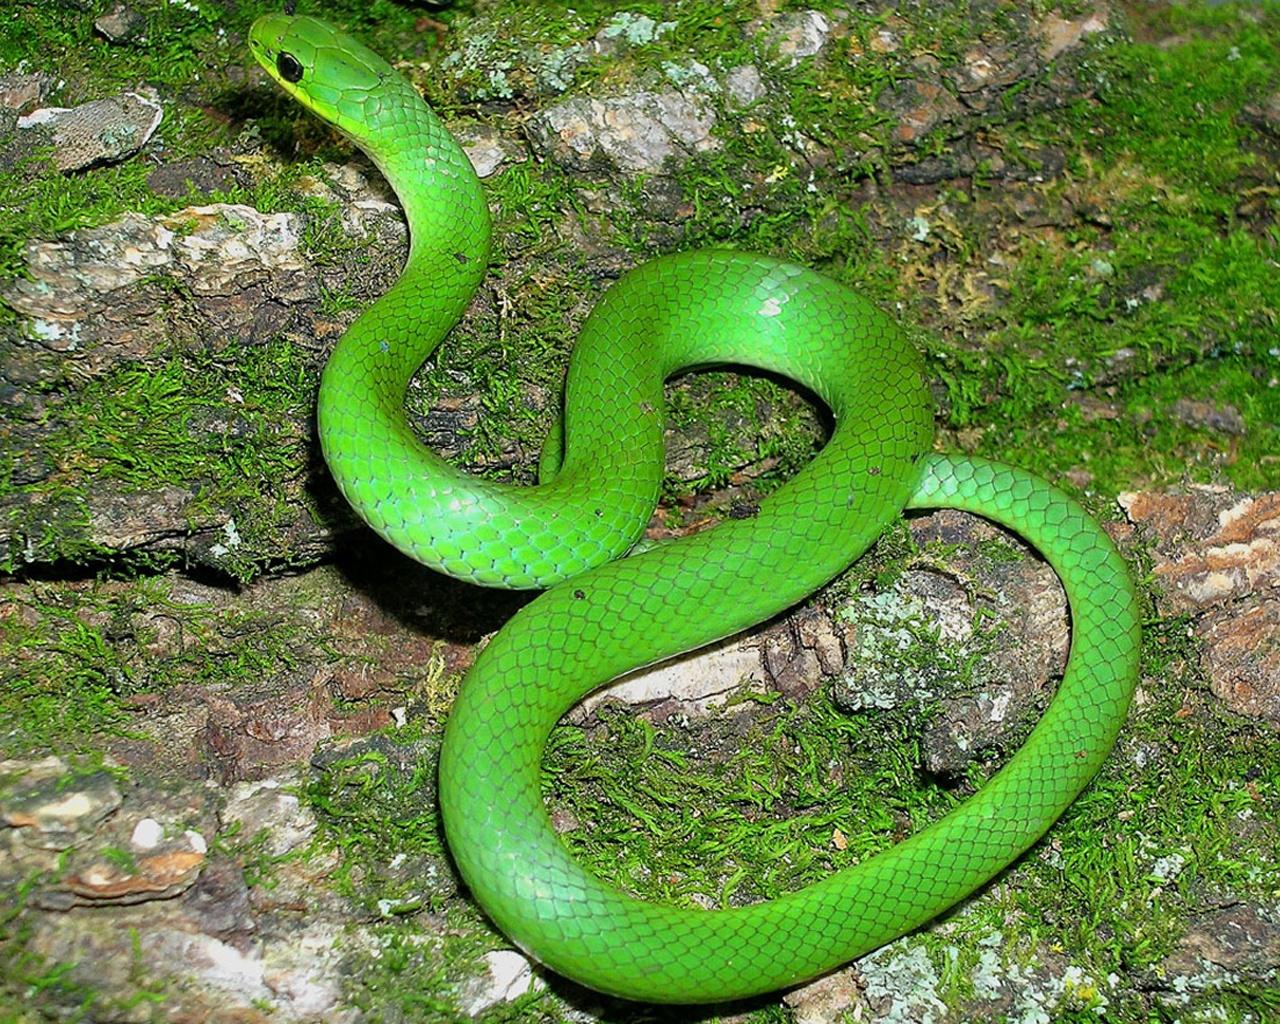 Green snake wallpaper wallpapersafari - Green snake hd wallpaper ...